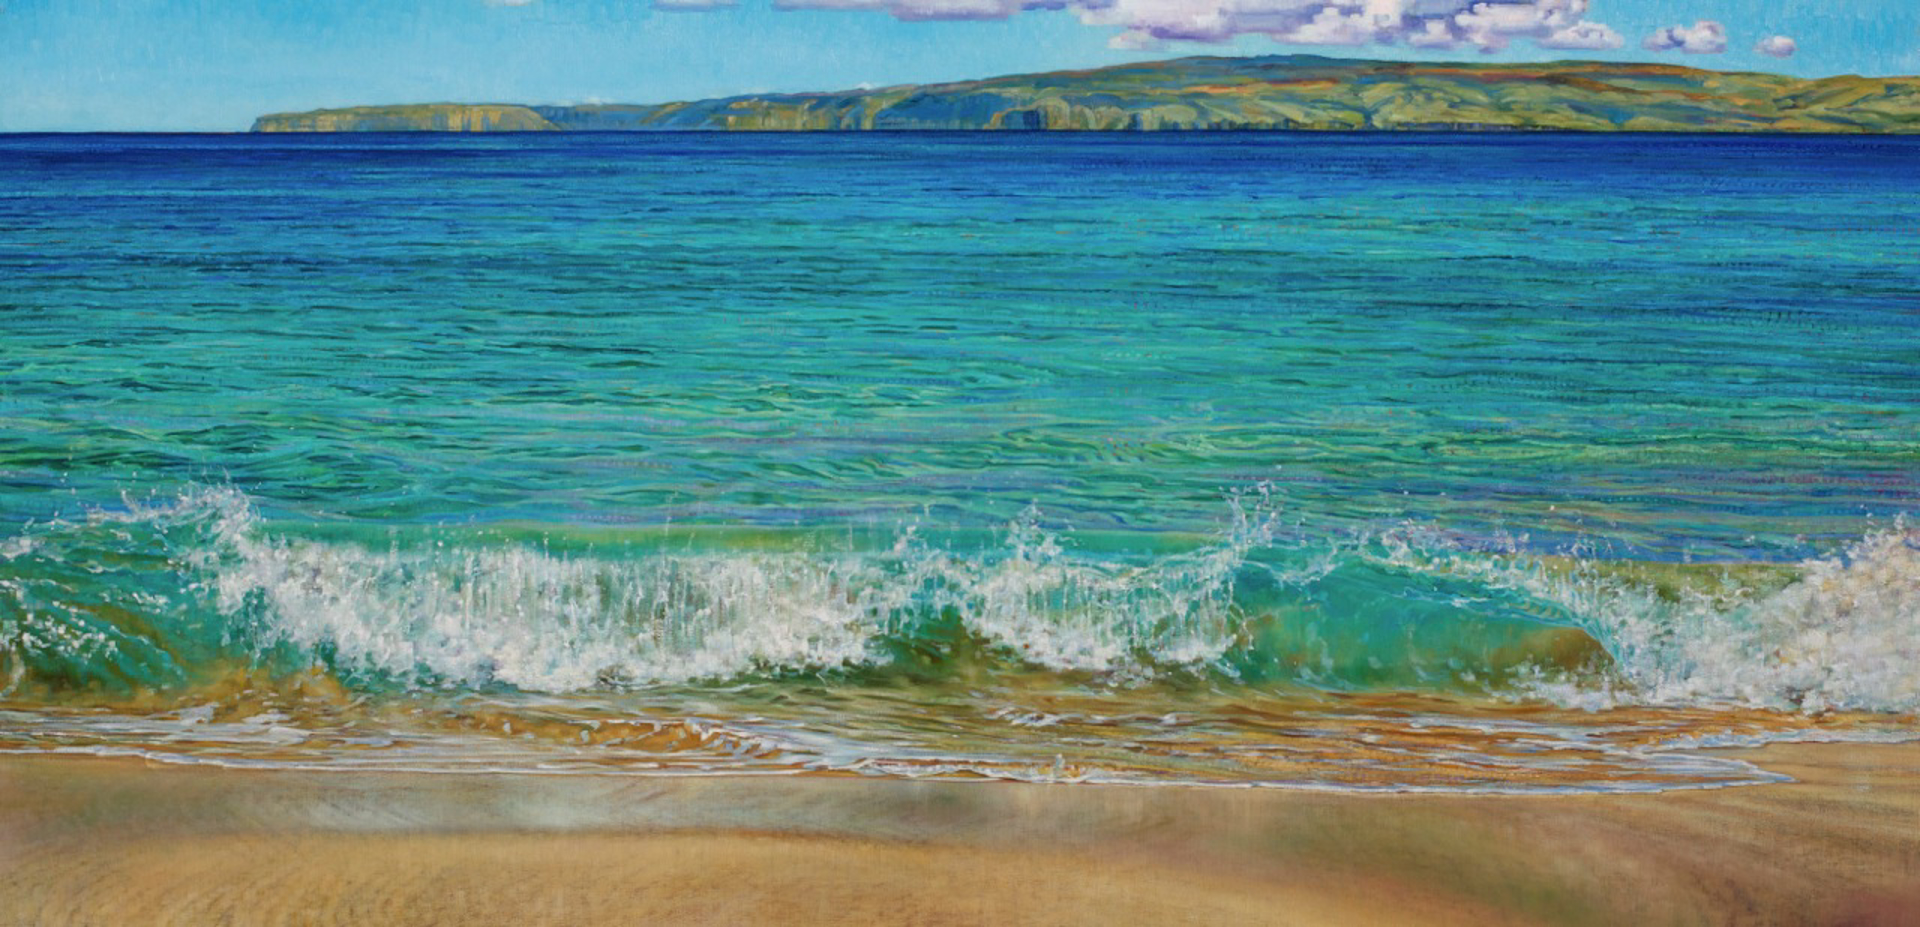 Makena Shorebreak by Caroline Zimmermann